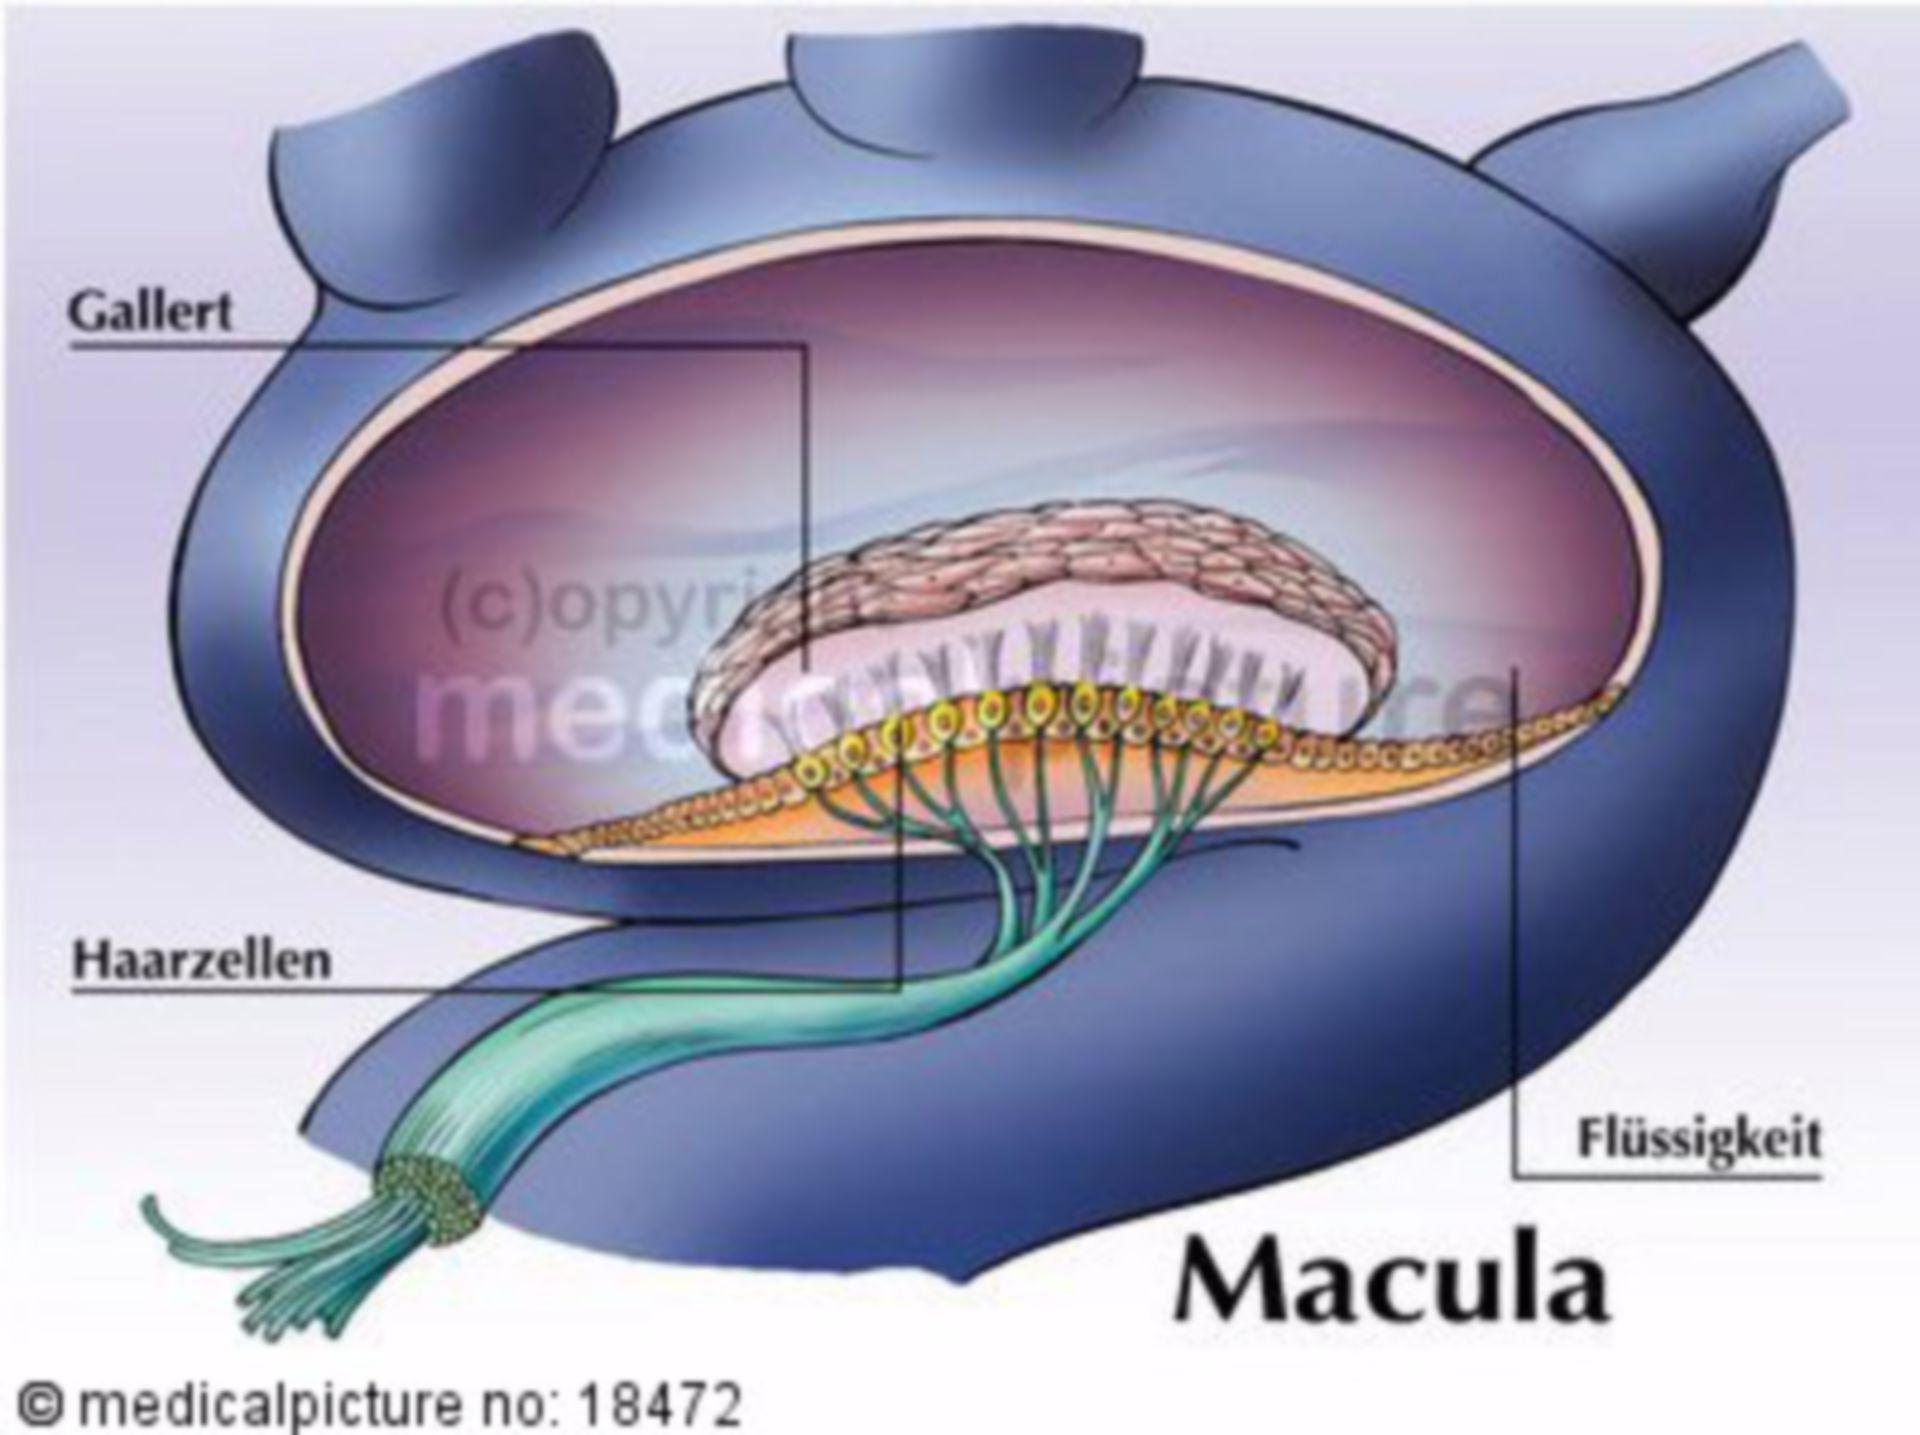 Macula statica, Gleichgewichtsorgan